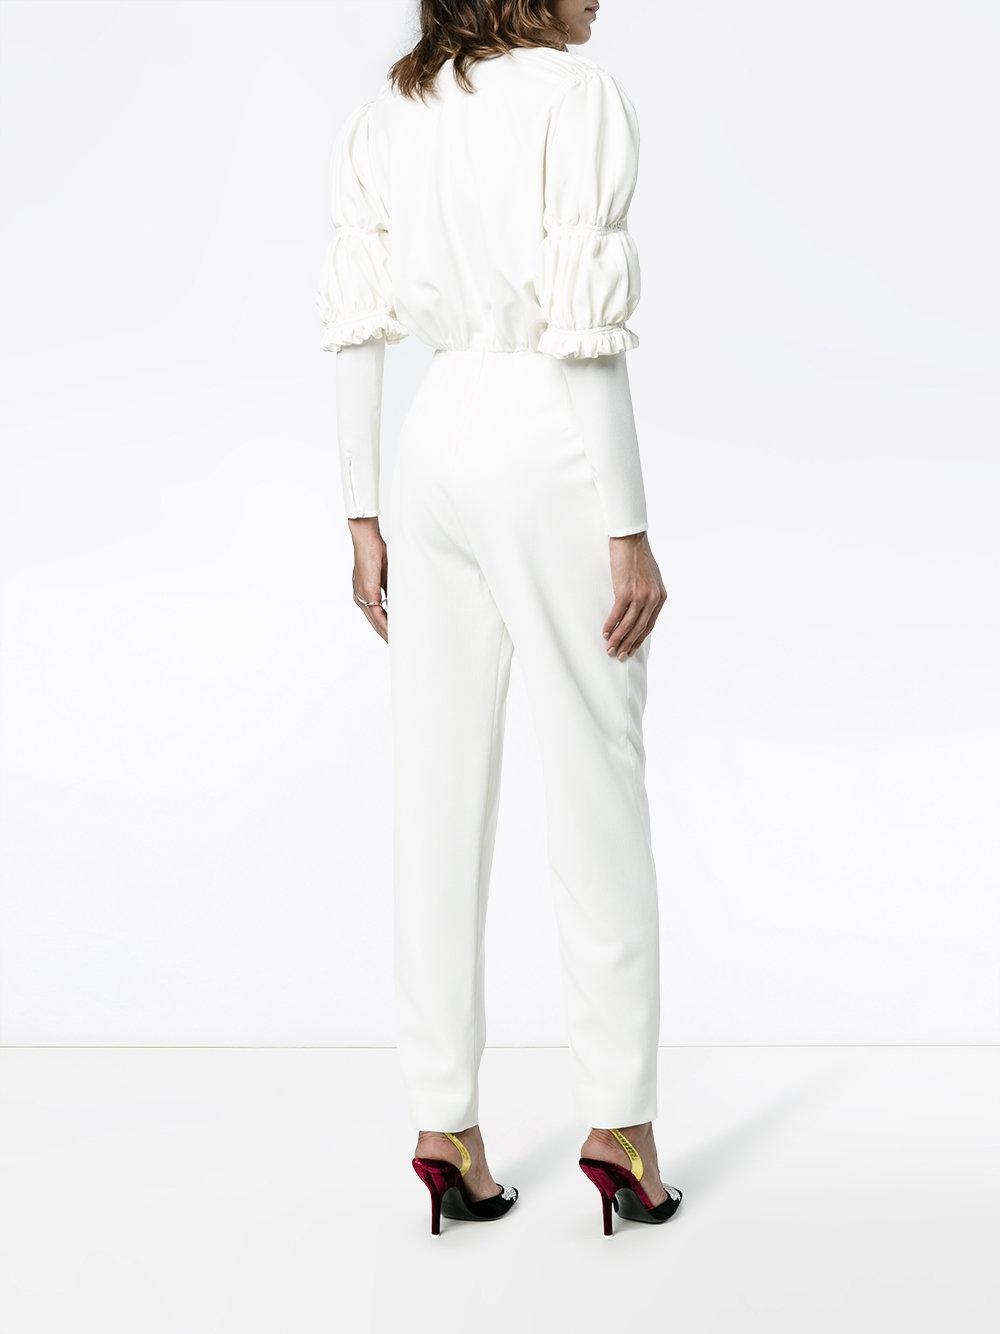 df9a6b61e21 Emilia Wickstead Barrett Jumpsuit in White - Save 25.104602510460253% - Lyst